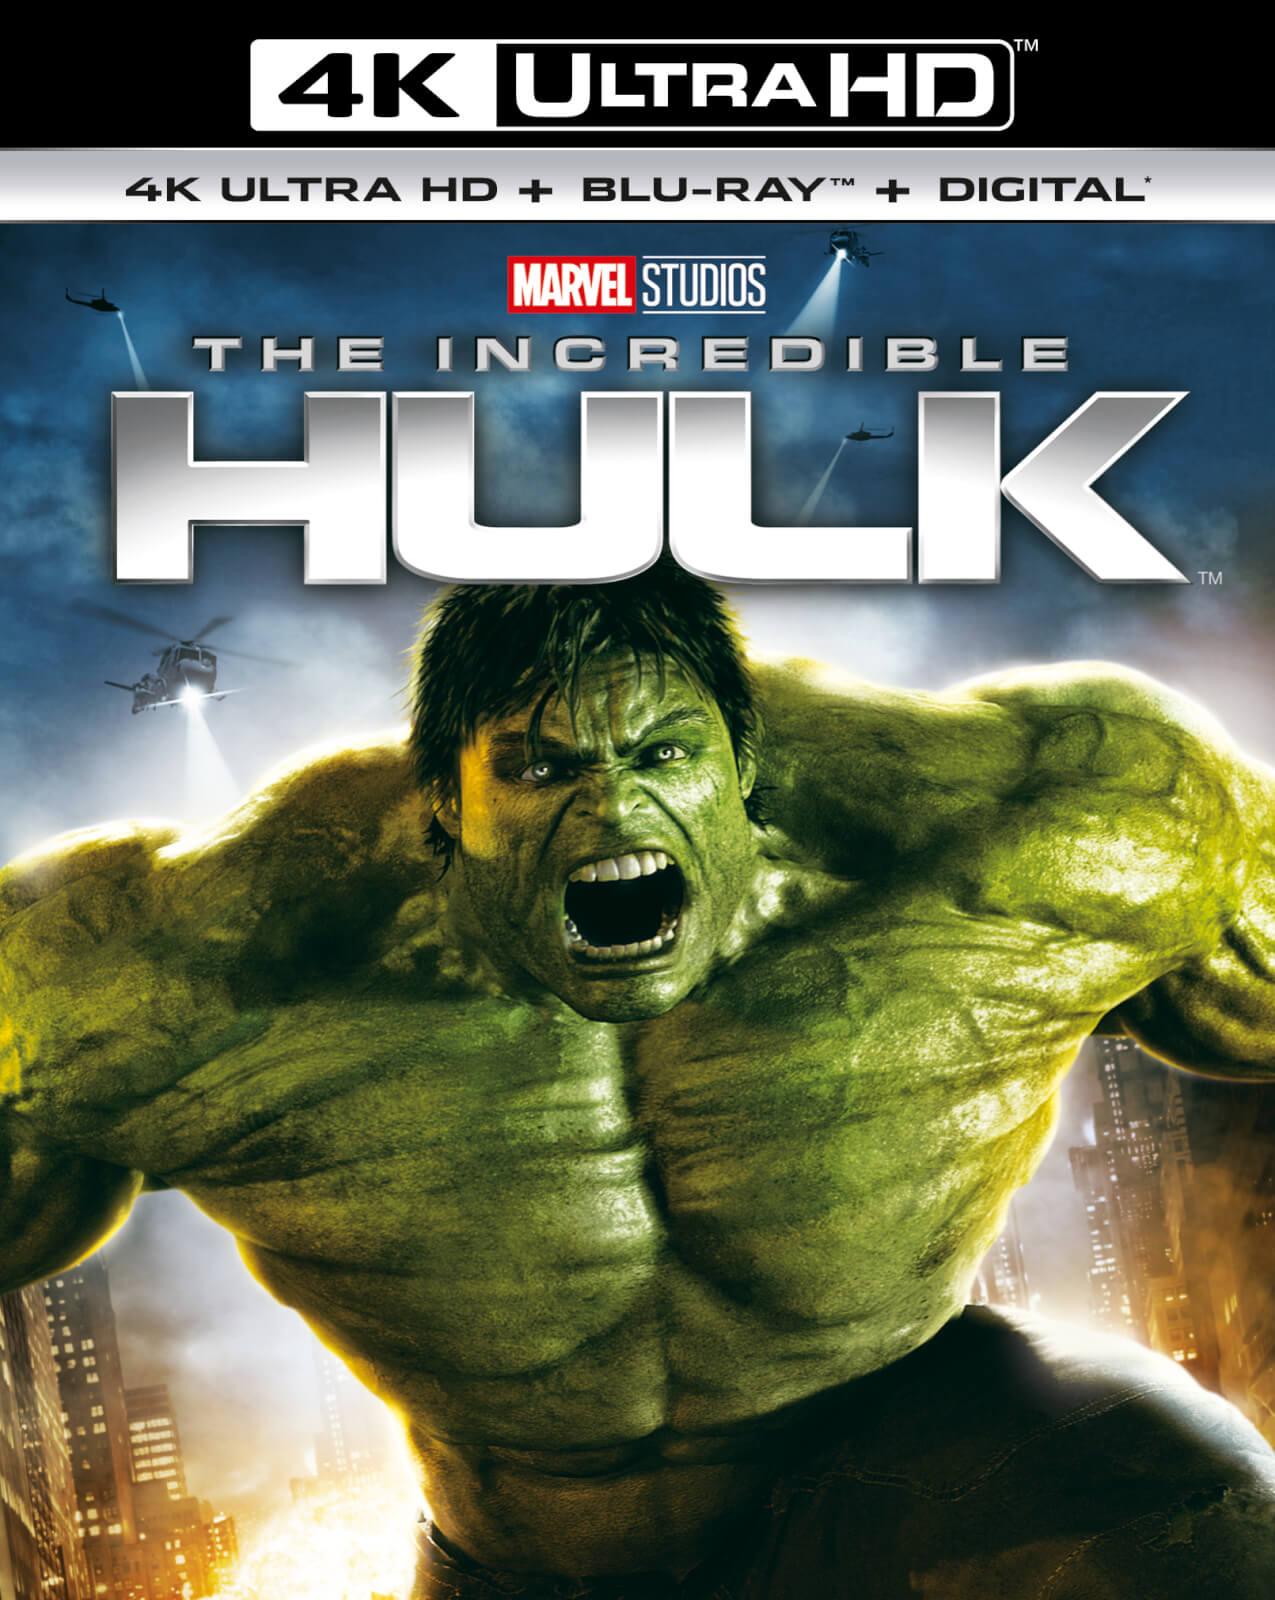 Avengers Animated Wallpaper The Incredible Hulk 4k Ultra Hd Blu Ray Zavvi